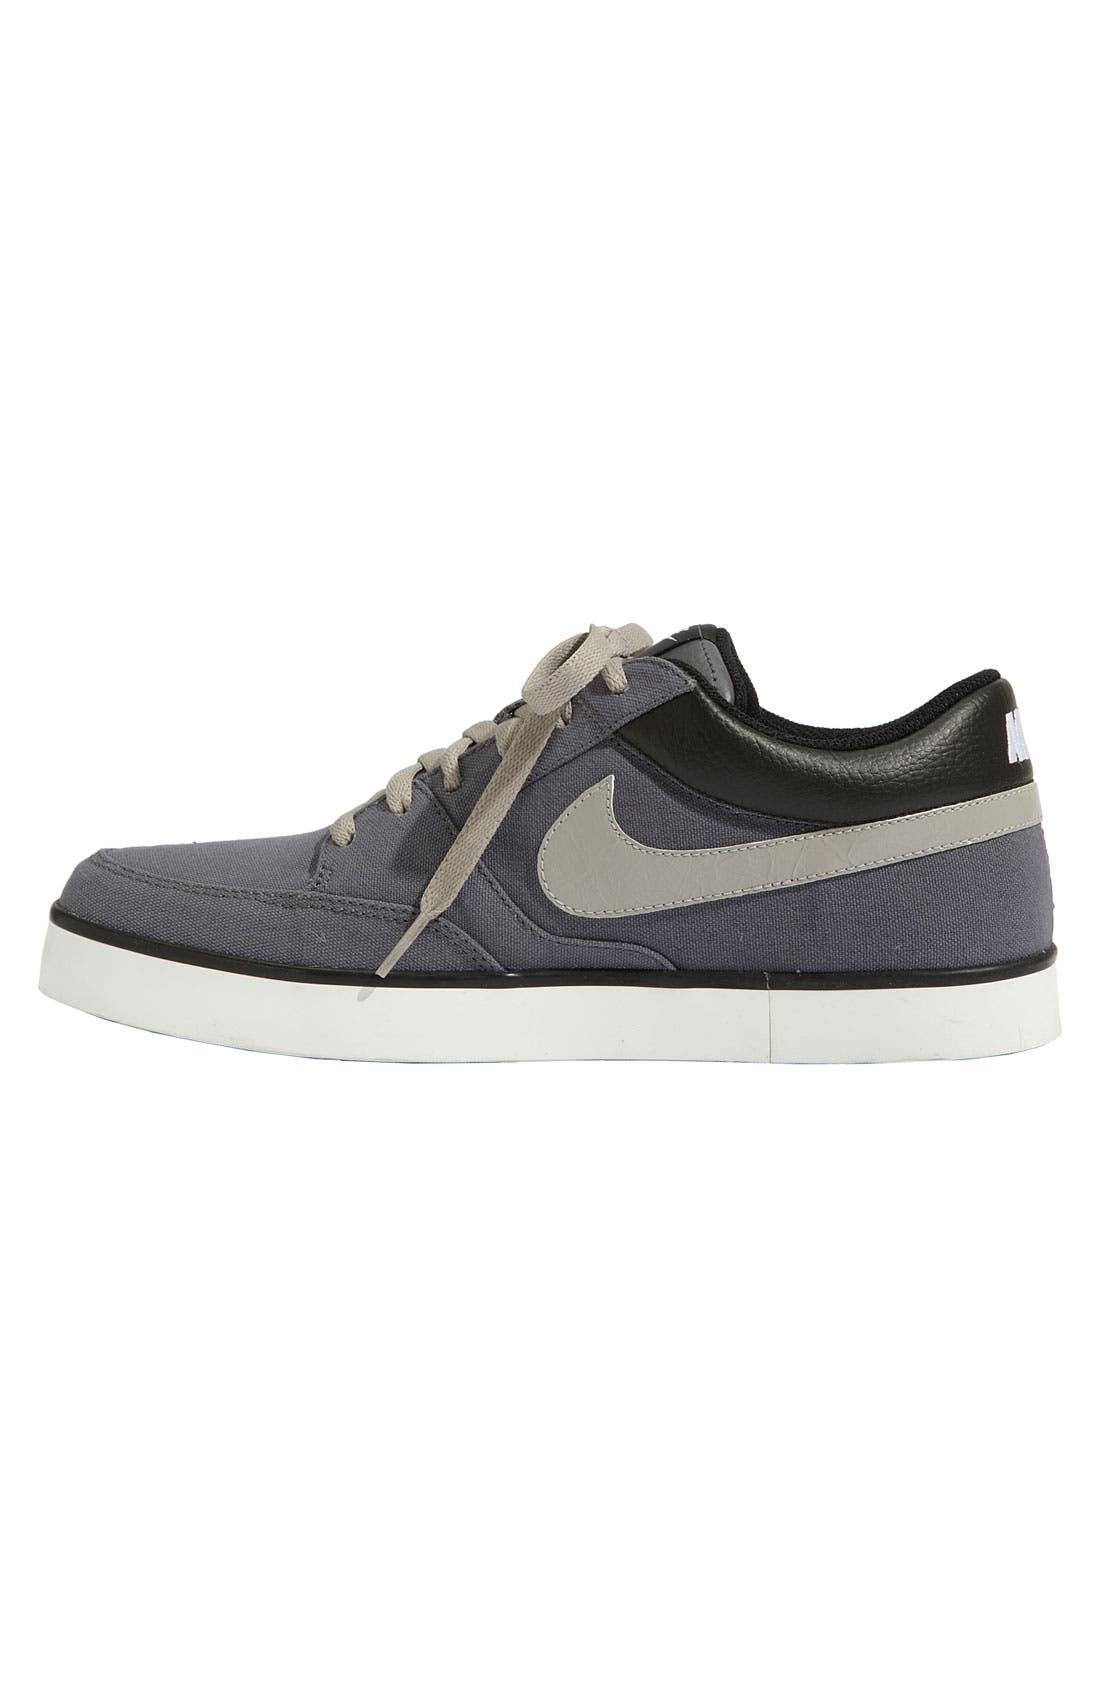 NIKE,                             'Avid' Sneaker,                             Alternate thumbnail 4, color,                             002